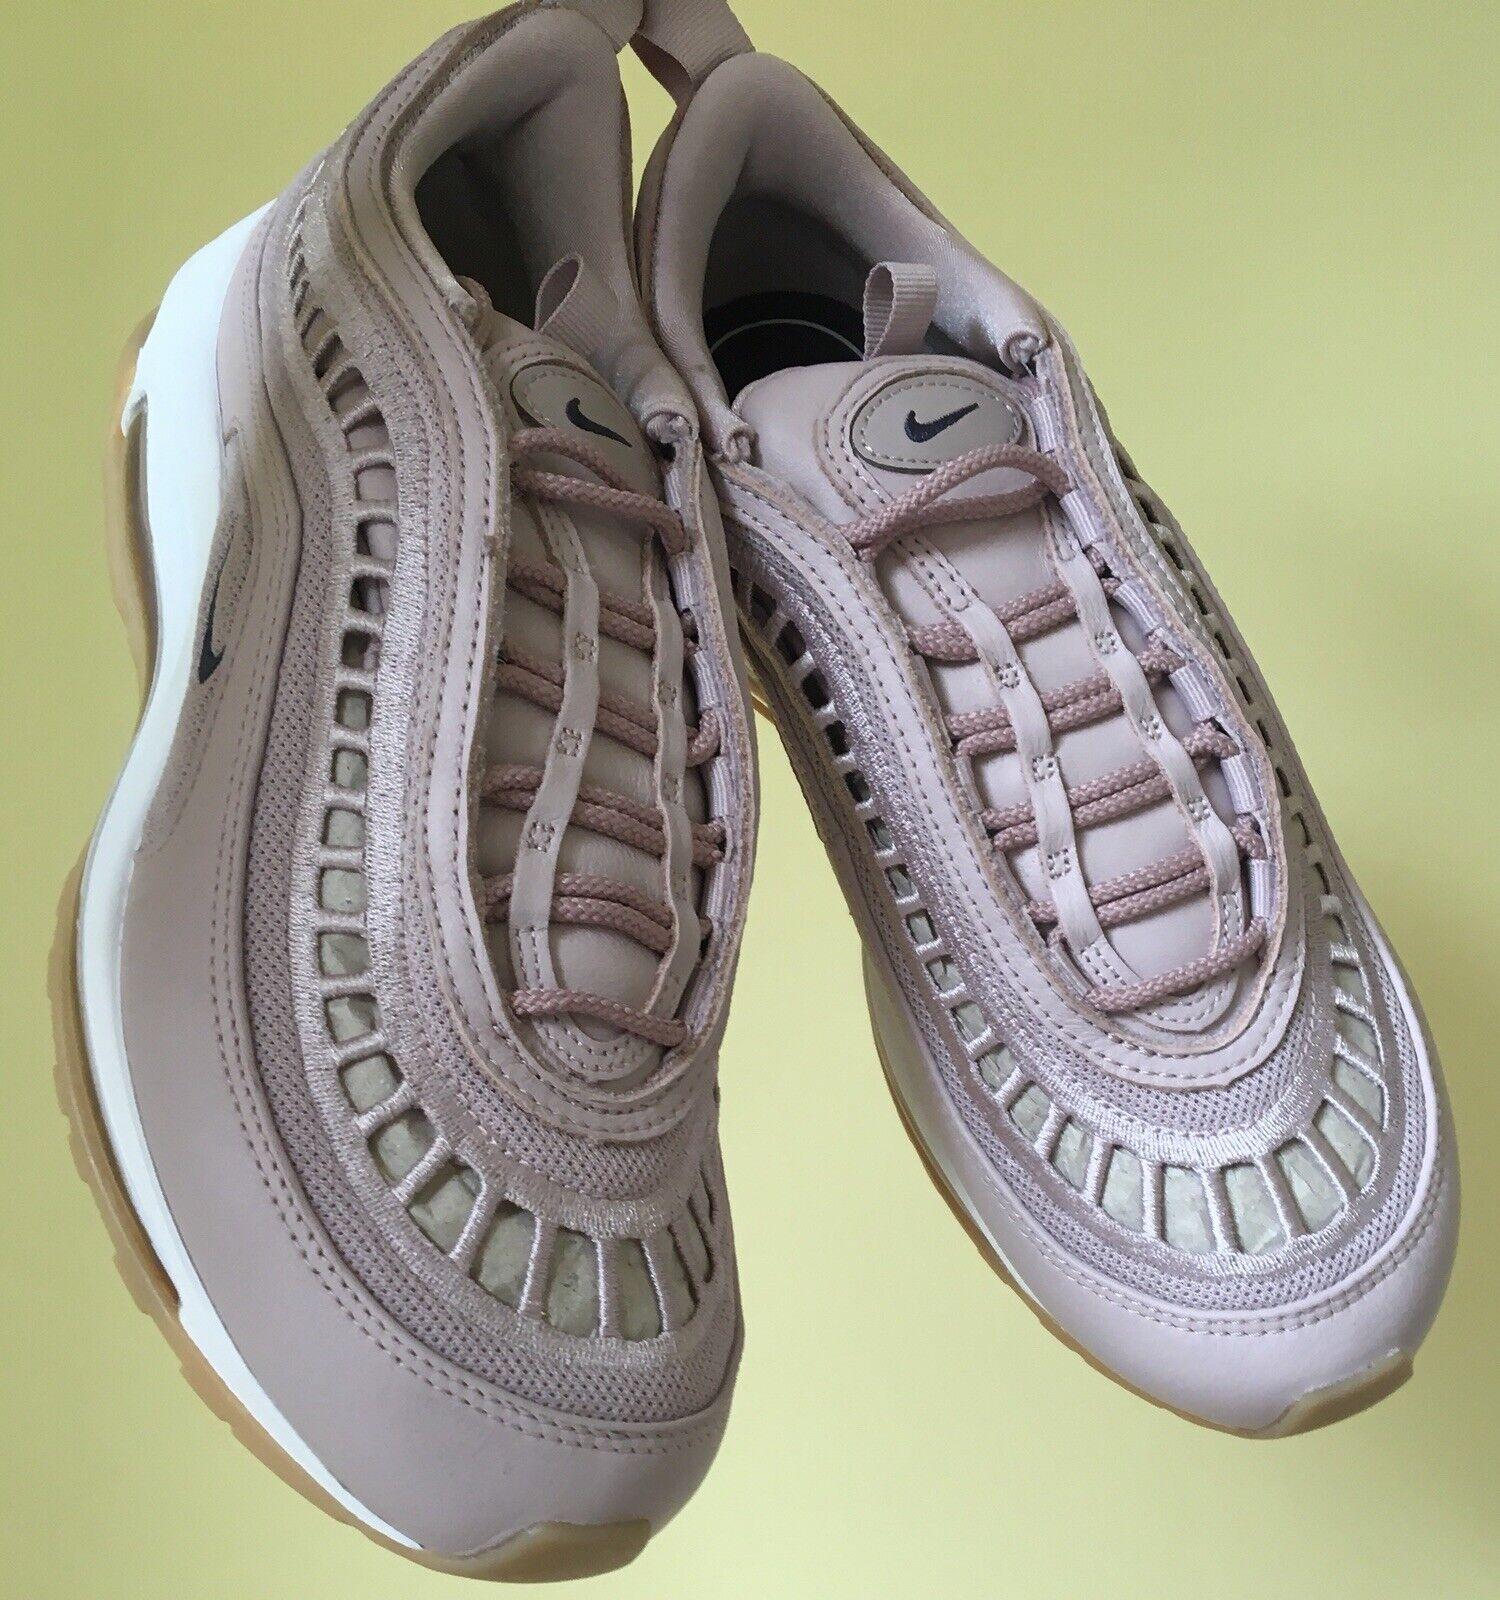 NUOVA linea donna Nike Air Max 97 Premium UL'17 si Scarpe da ginnastica Scarpe da ginnastica ltded RRP .95